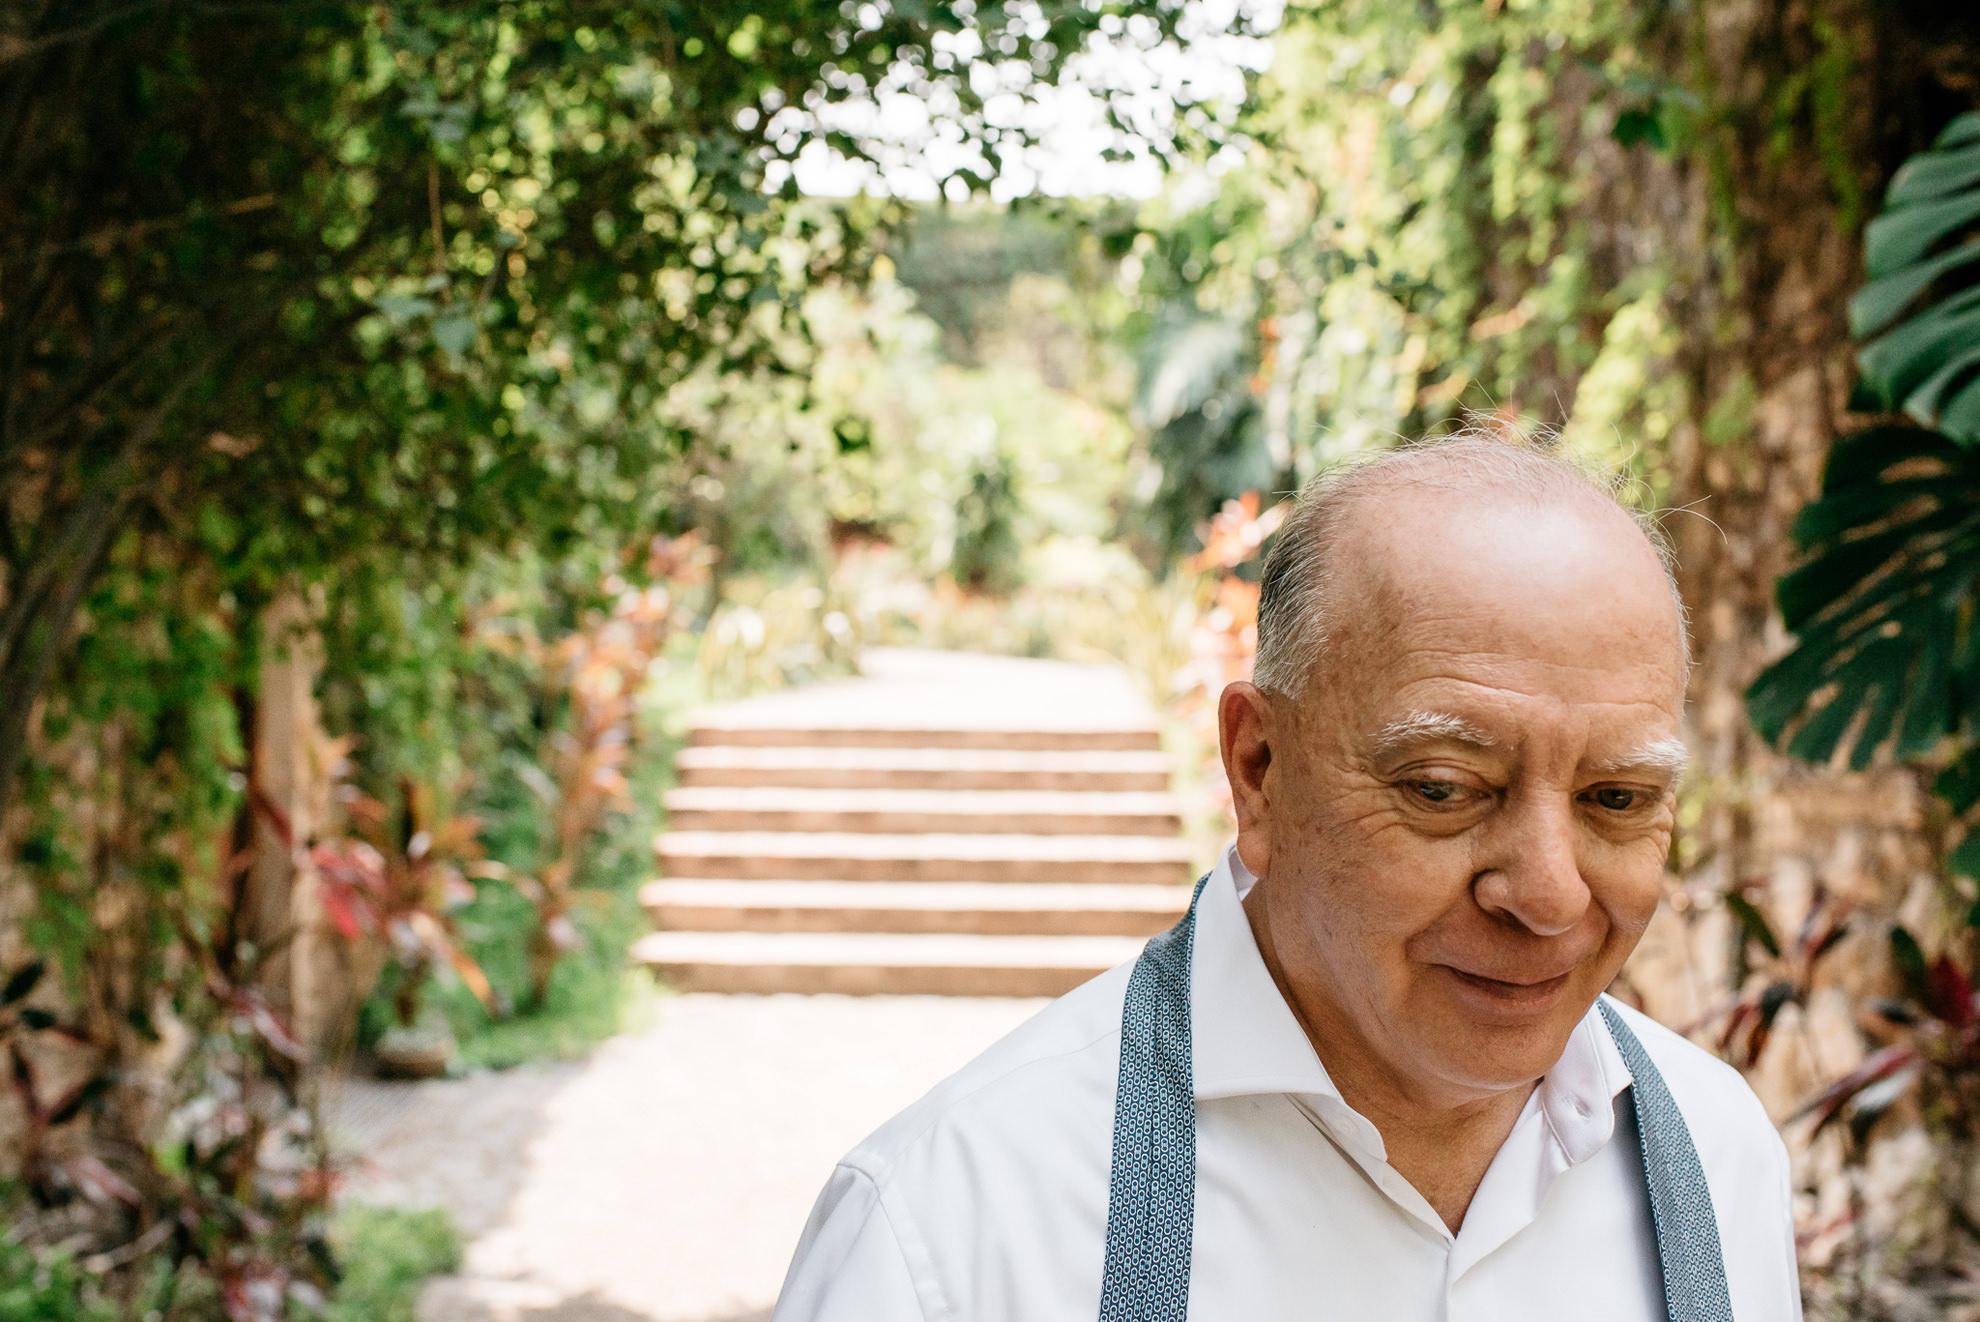 016 - hacienda san carlos.jpg